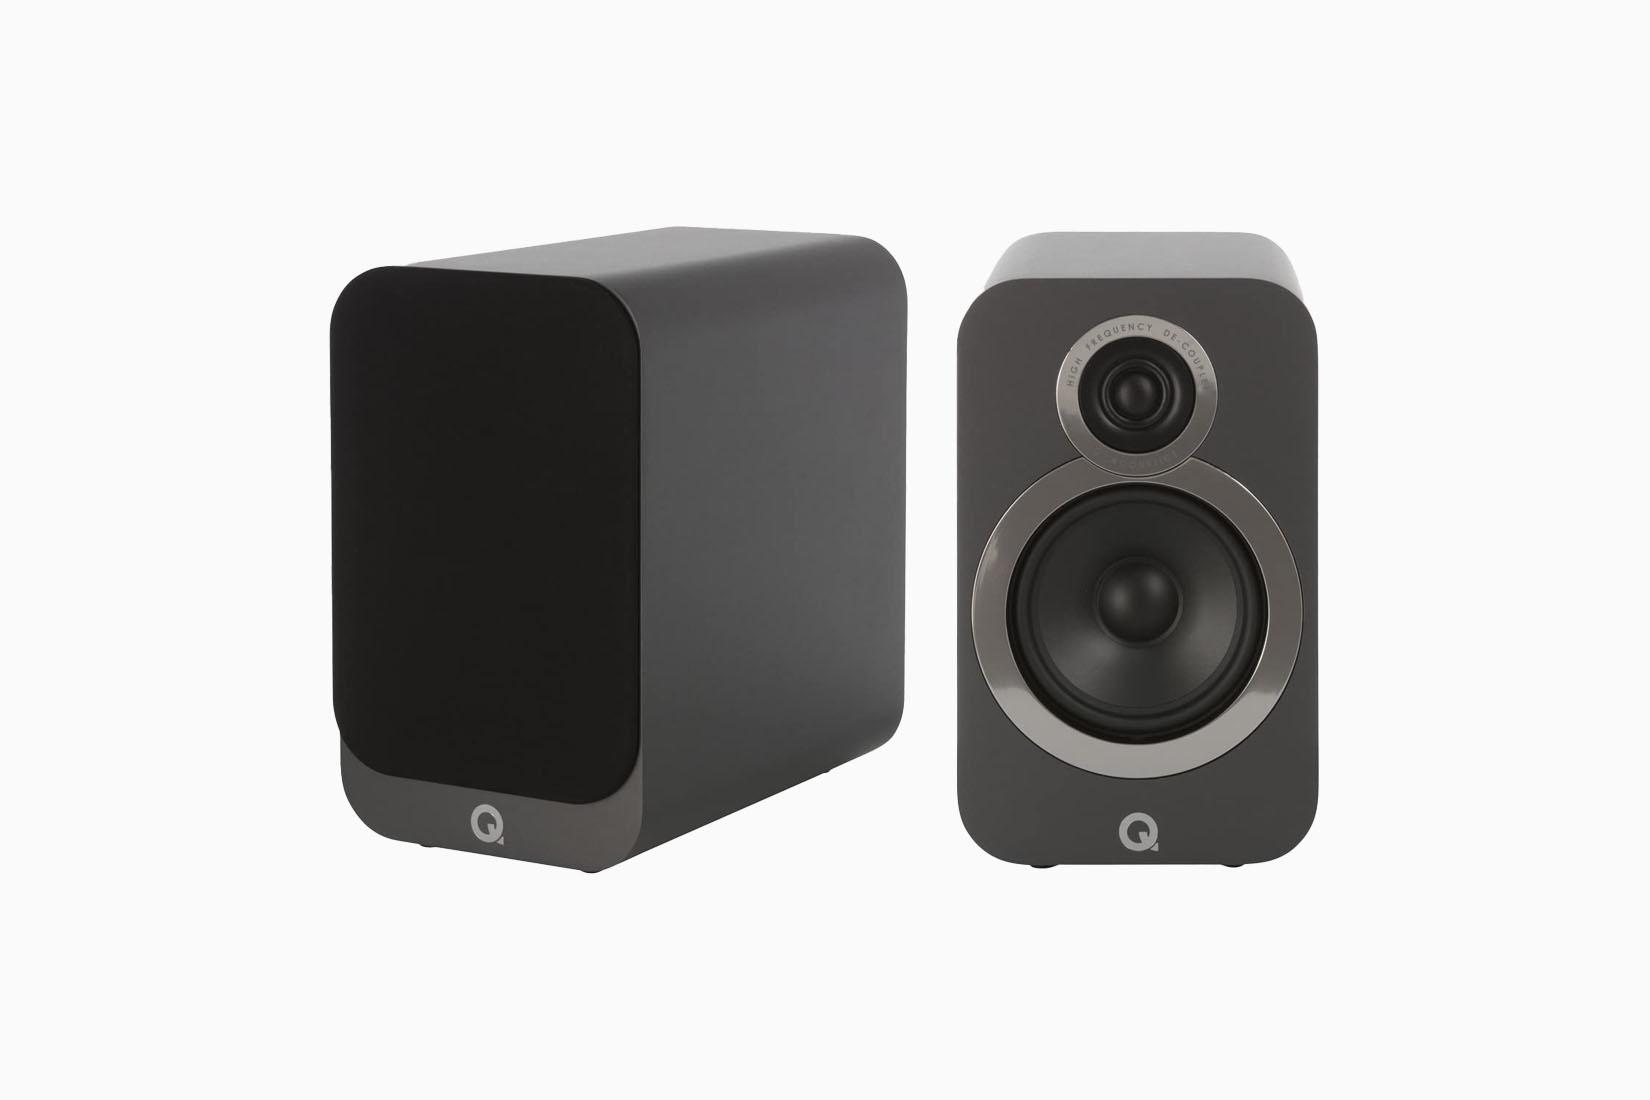 best bookshelf speakers q acoustics review Luxe Digital